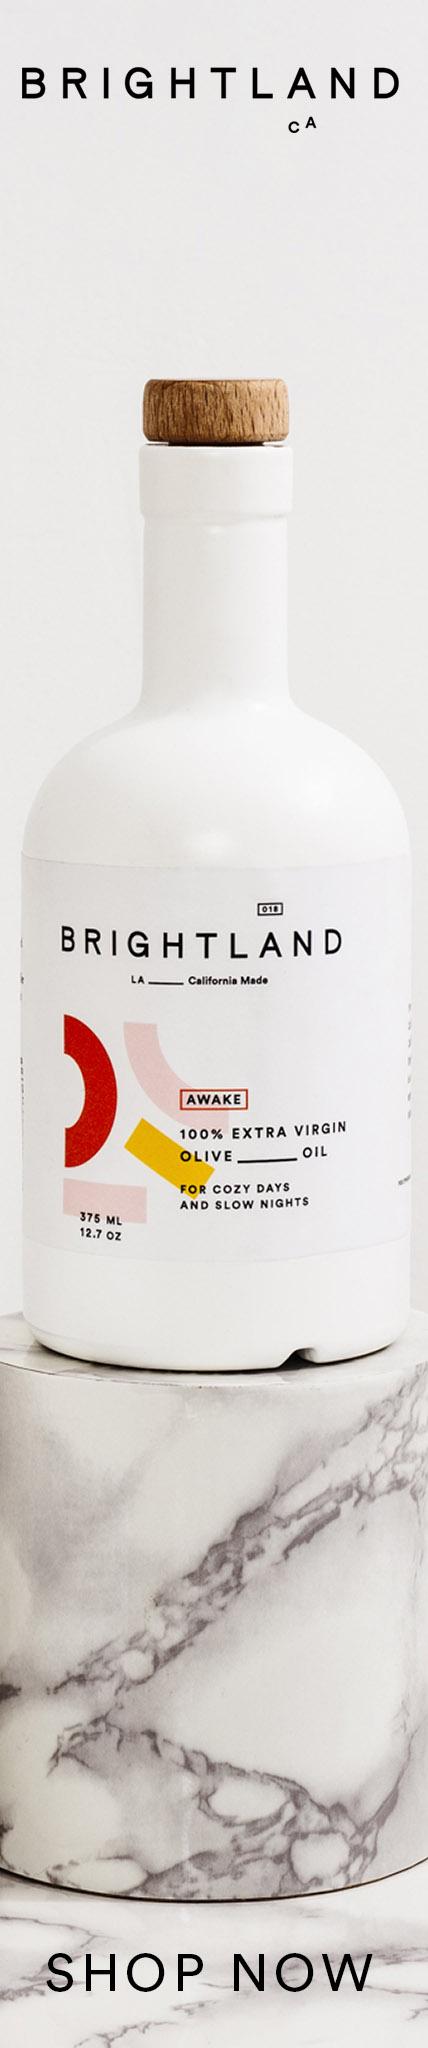 Brightland.jpg